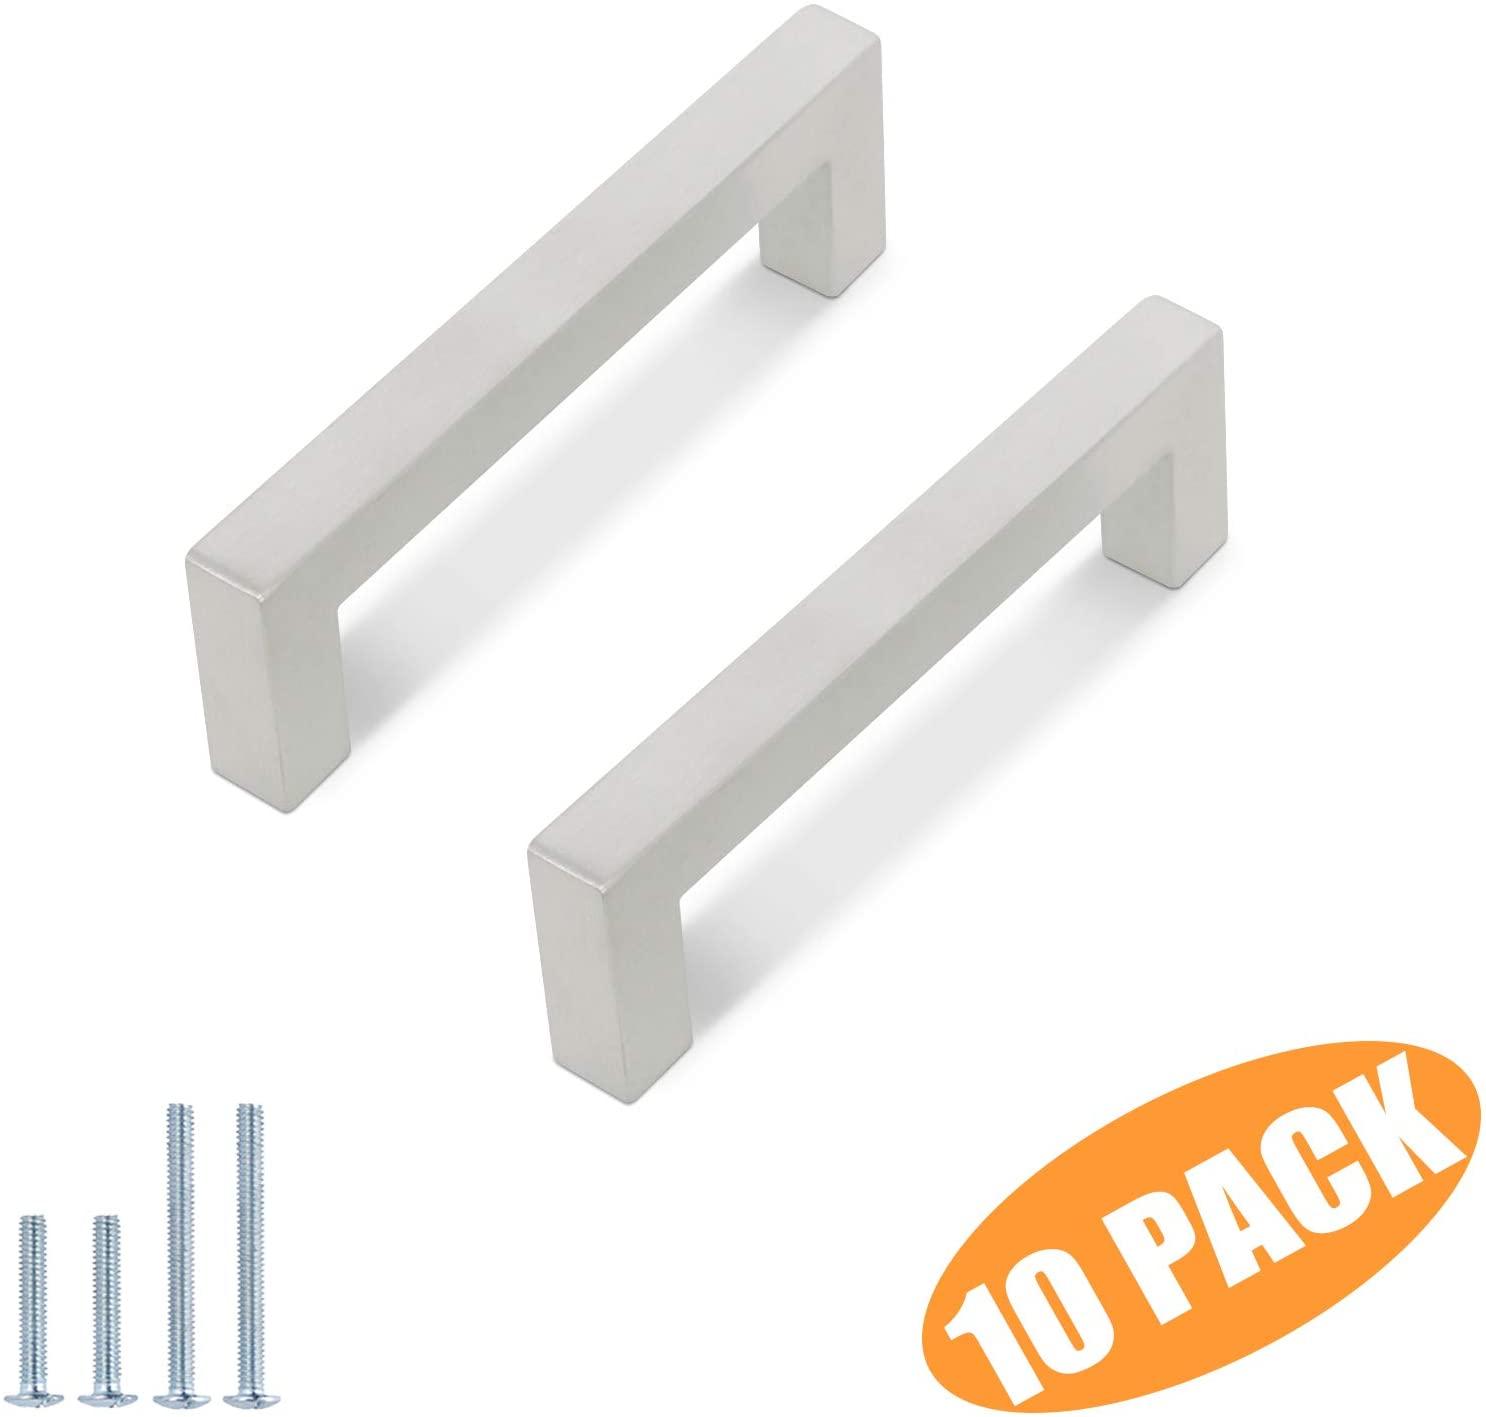 (10 Pack) Probrico 4 Inch Modern Square Cabinet Handles Pulls Stainless Steel,T Bar Satin Nickel Handle Pull for Drawer Dresser Cupboard Wardrobe Bathroom Vanity,Kitchen Furniture Hardware